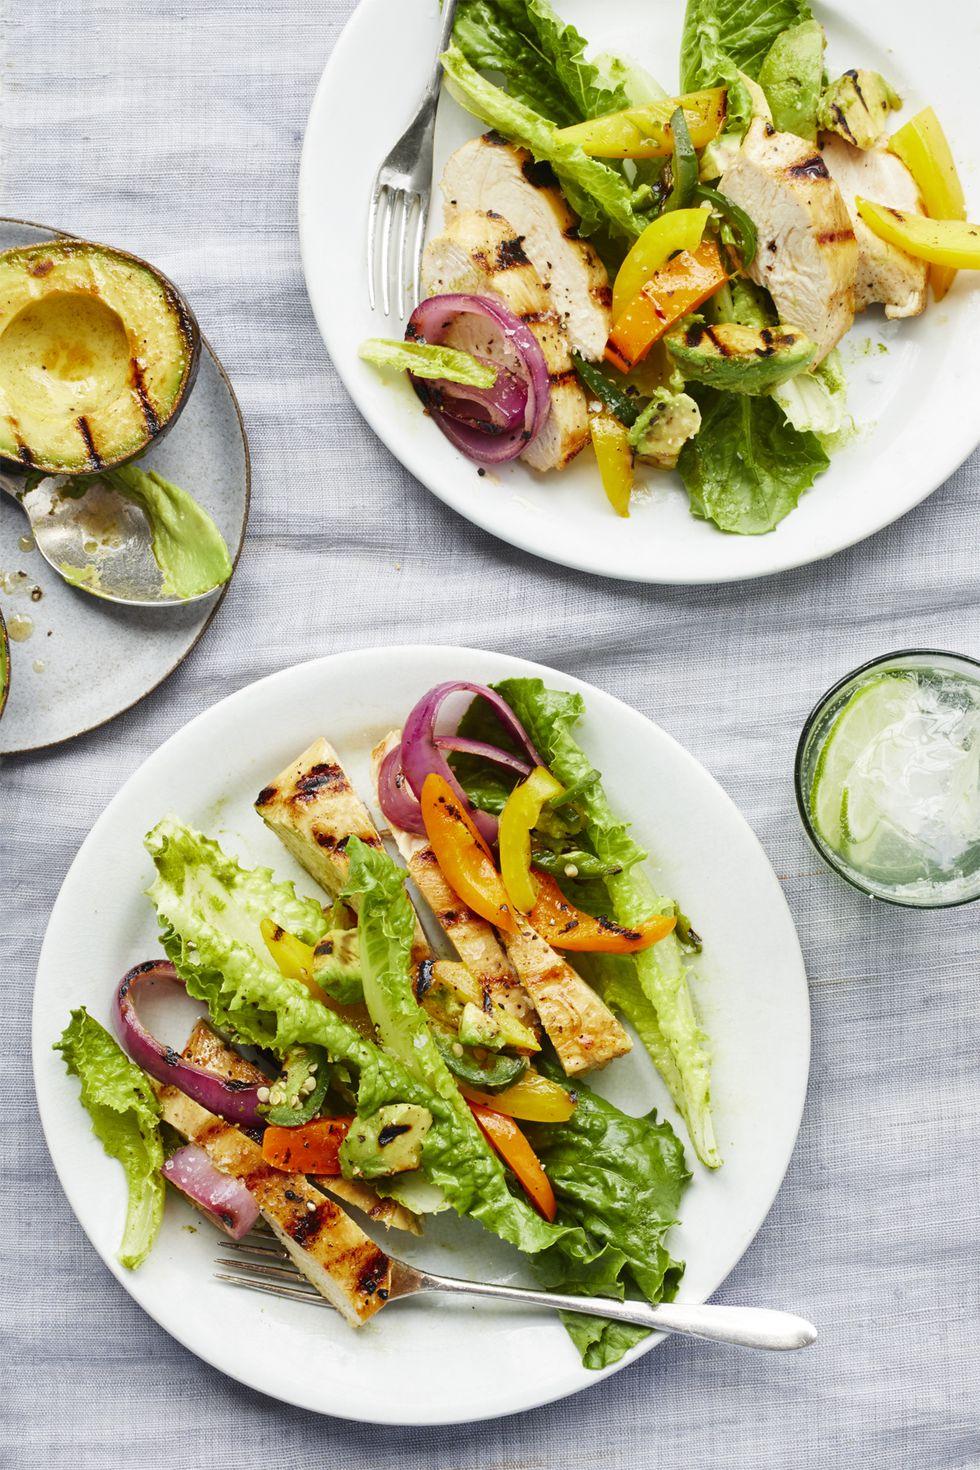 Chicken salad easy weeknight meal